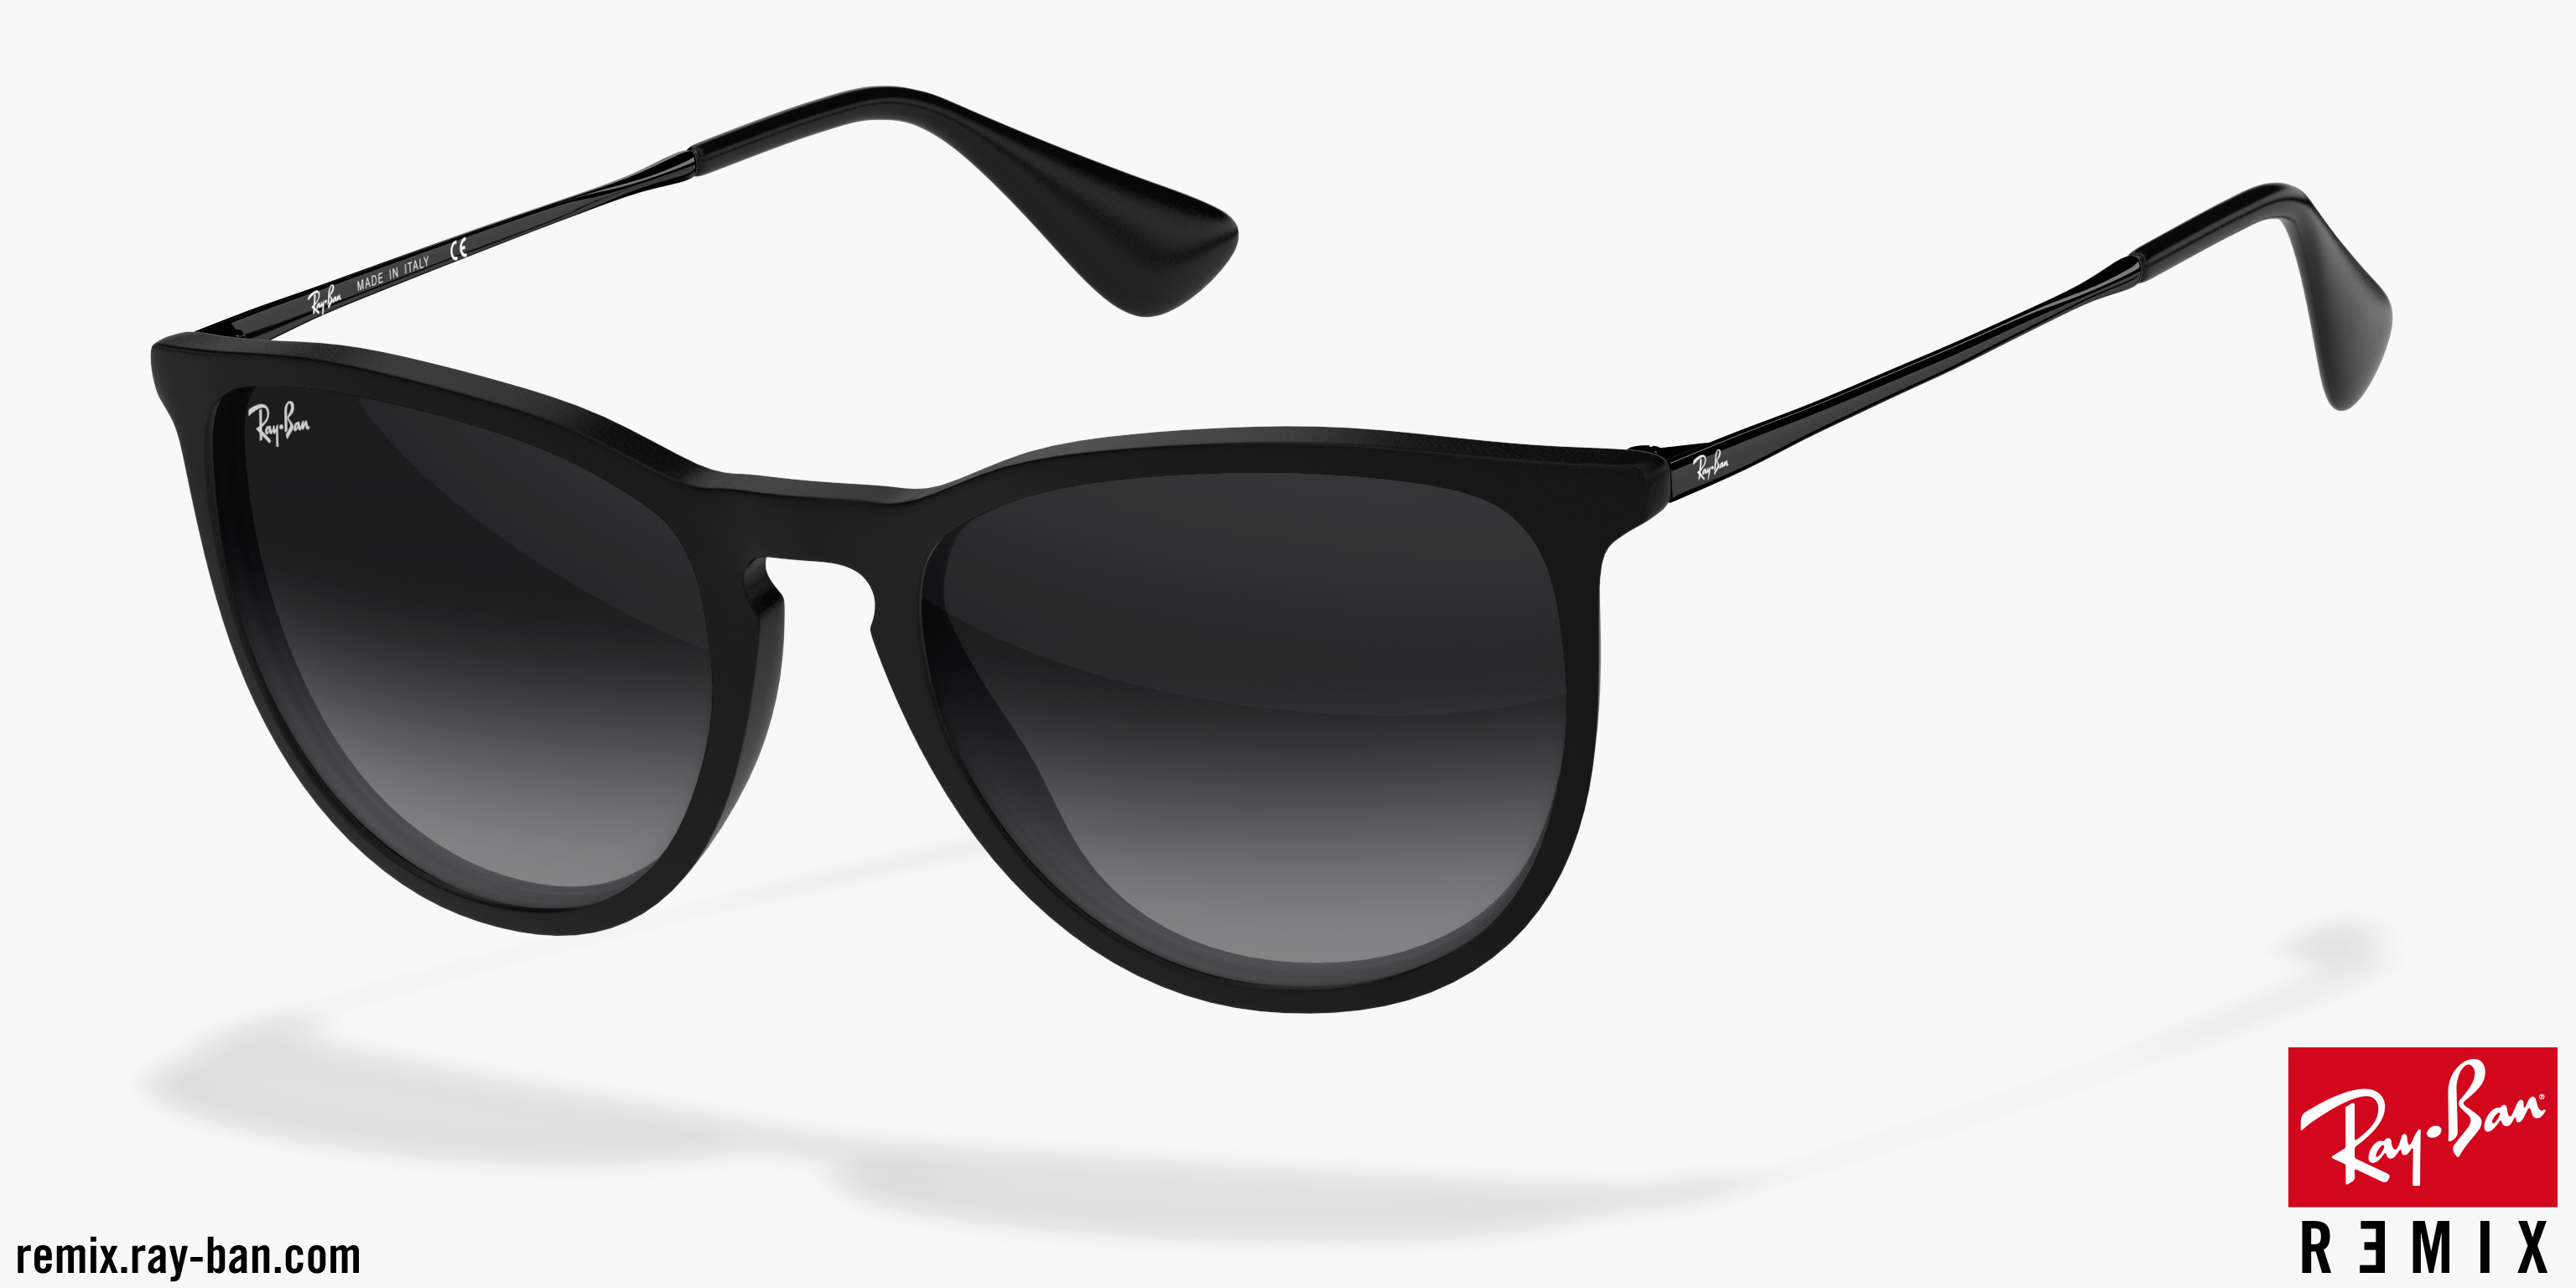 ray ban outlet ellenton  ray ban erika sonnenbrille m?nner